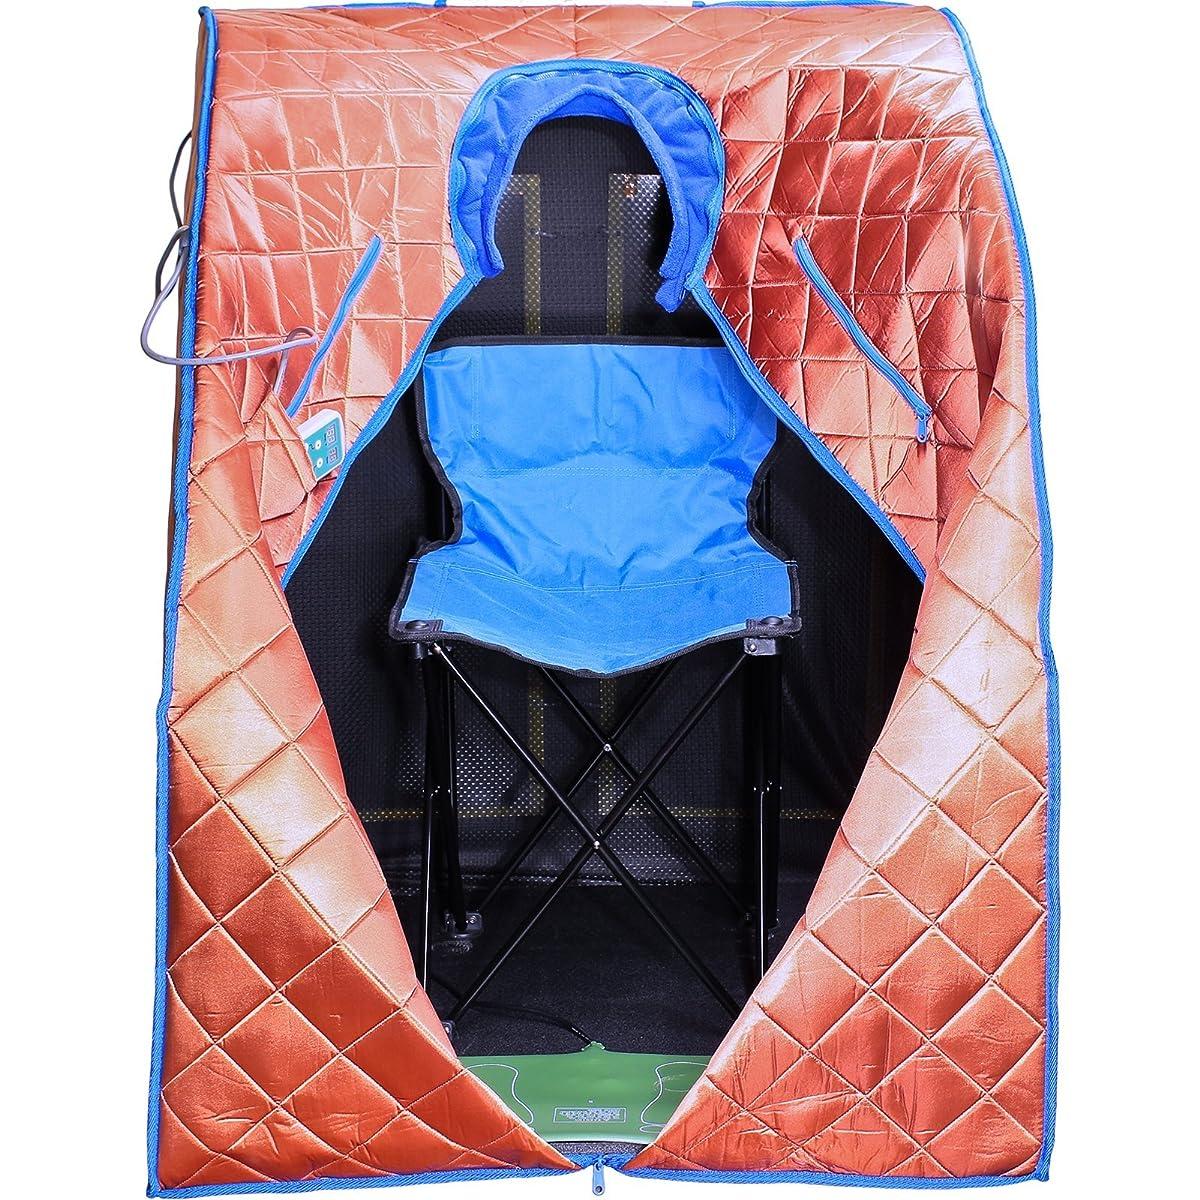 DURHERM XLarge Negative Ion FIR Infrared Portable Indoor Sauna w/ Chair Footpad